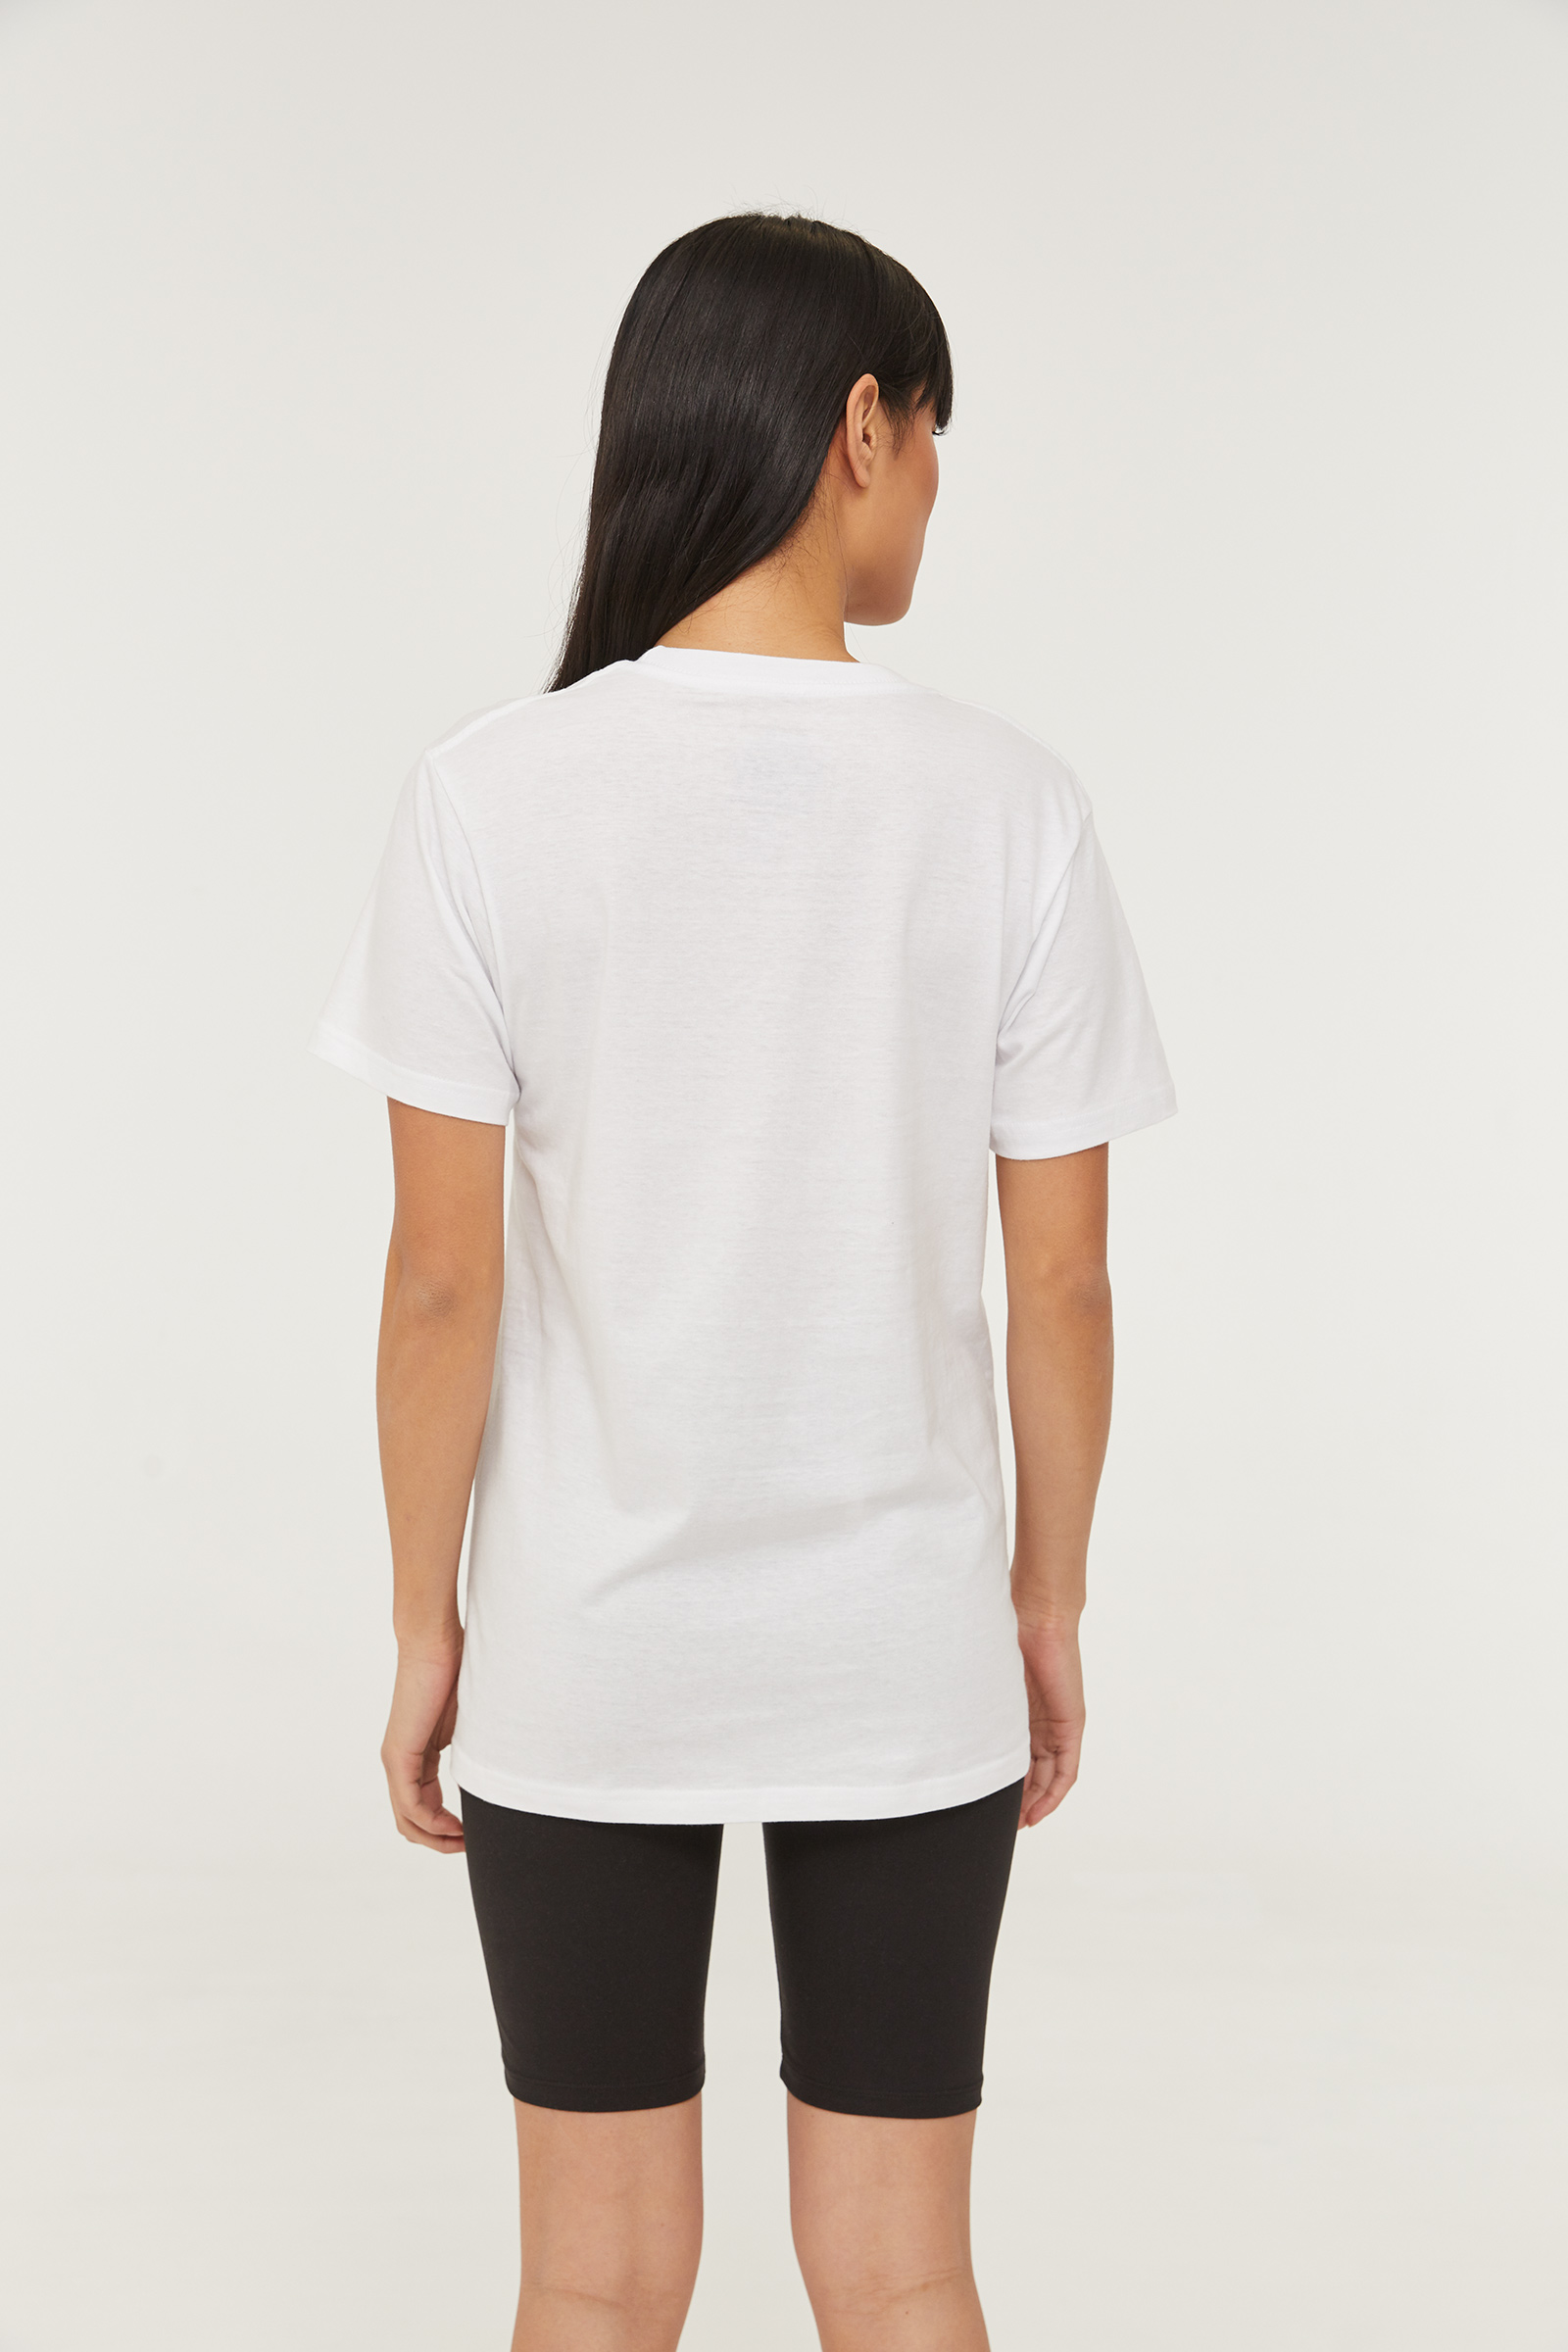 T-shirt Lil Yachty